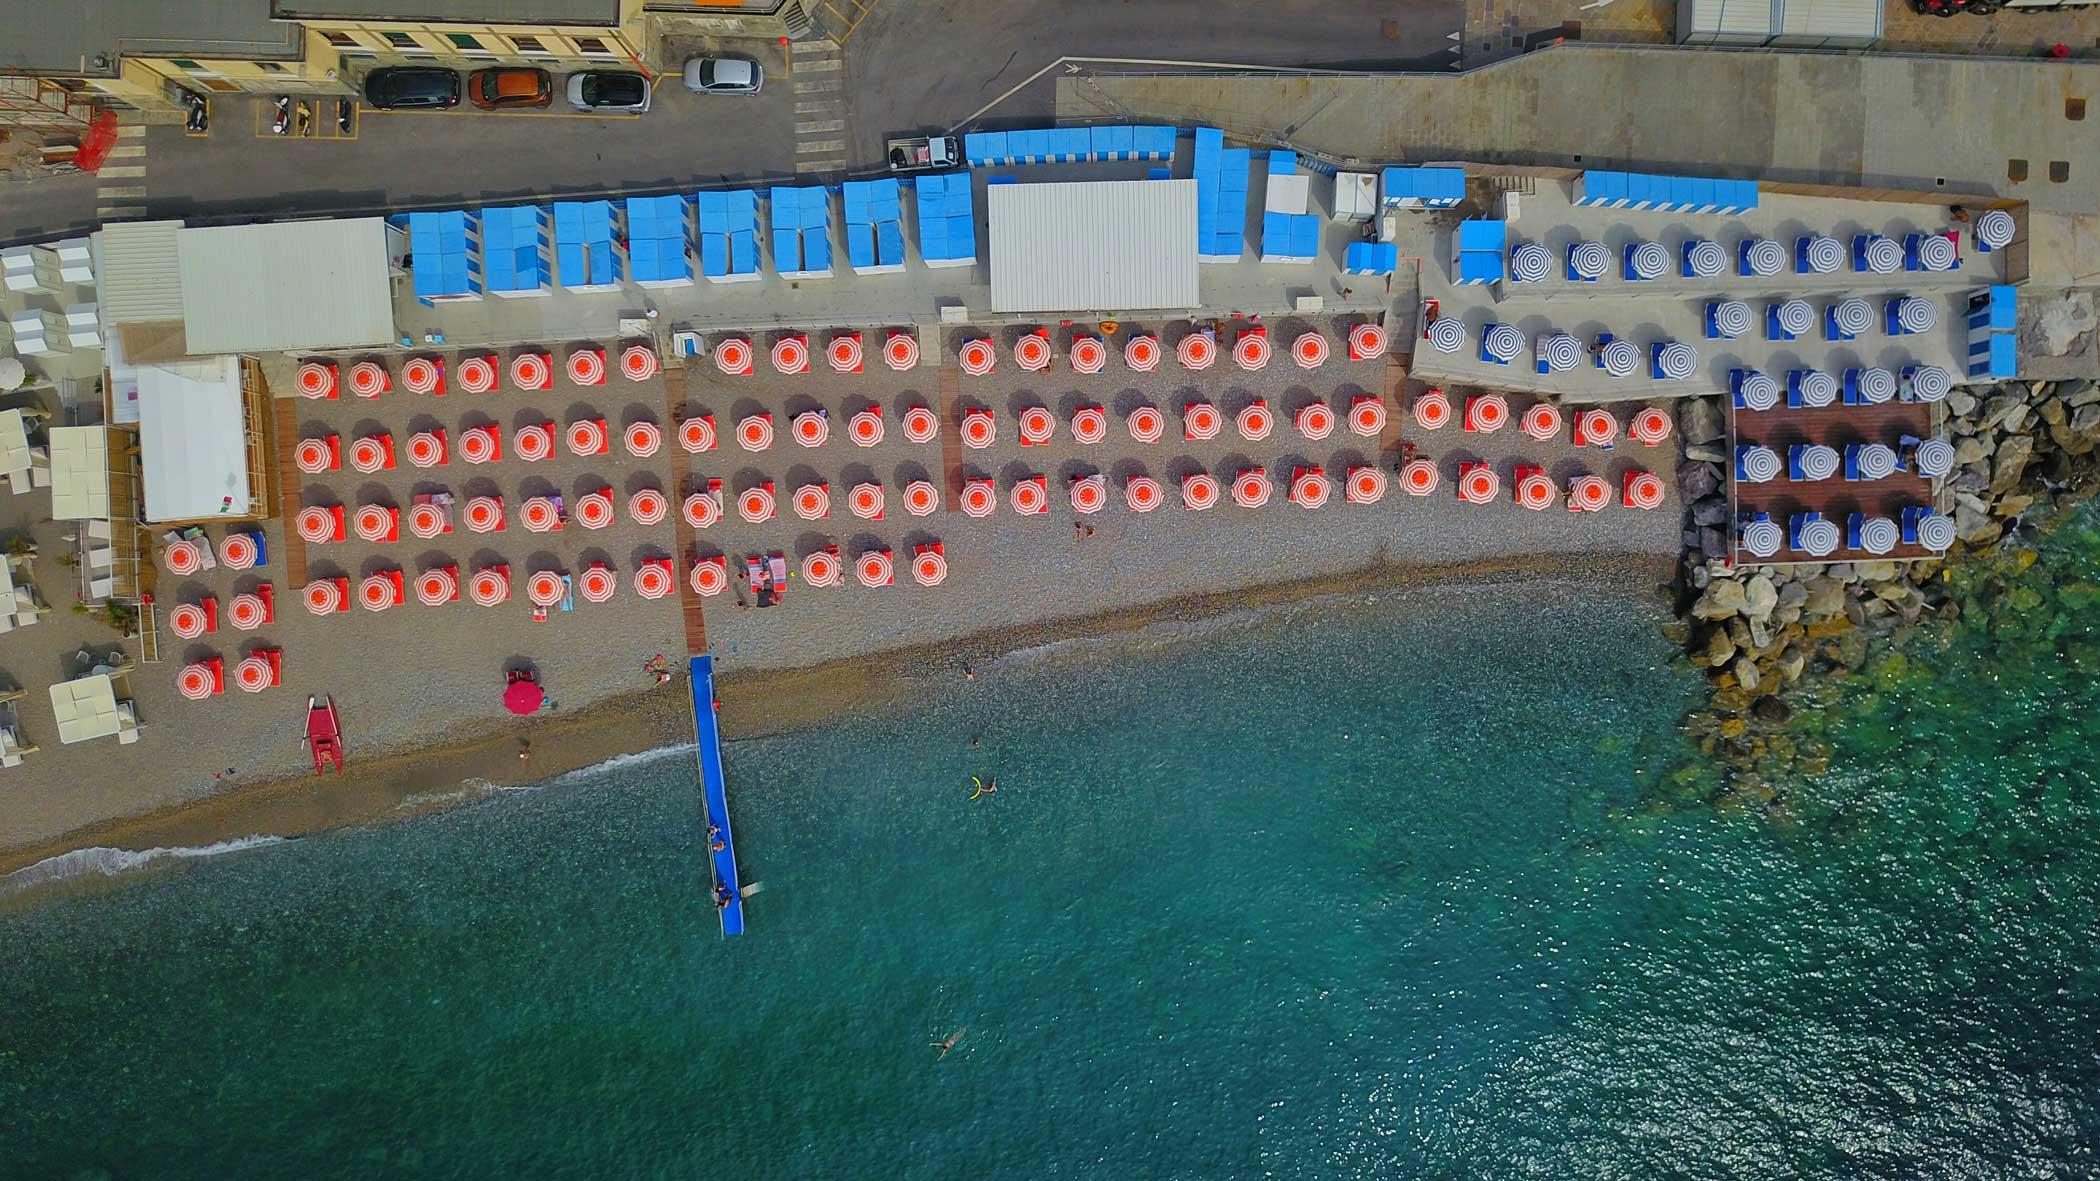 Bagni Sirena dall'alto - Santa Margherita Ligure 2020